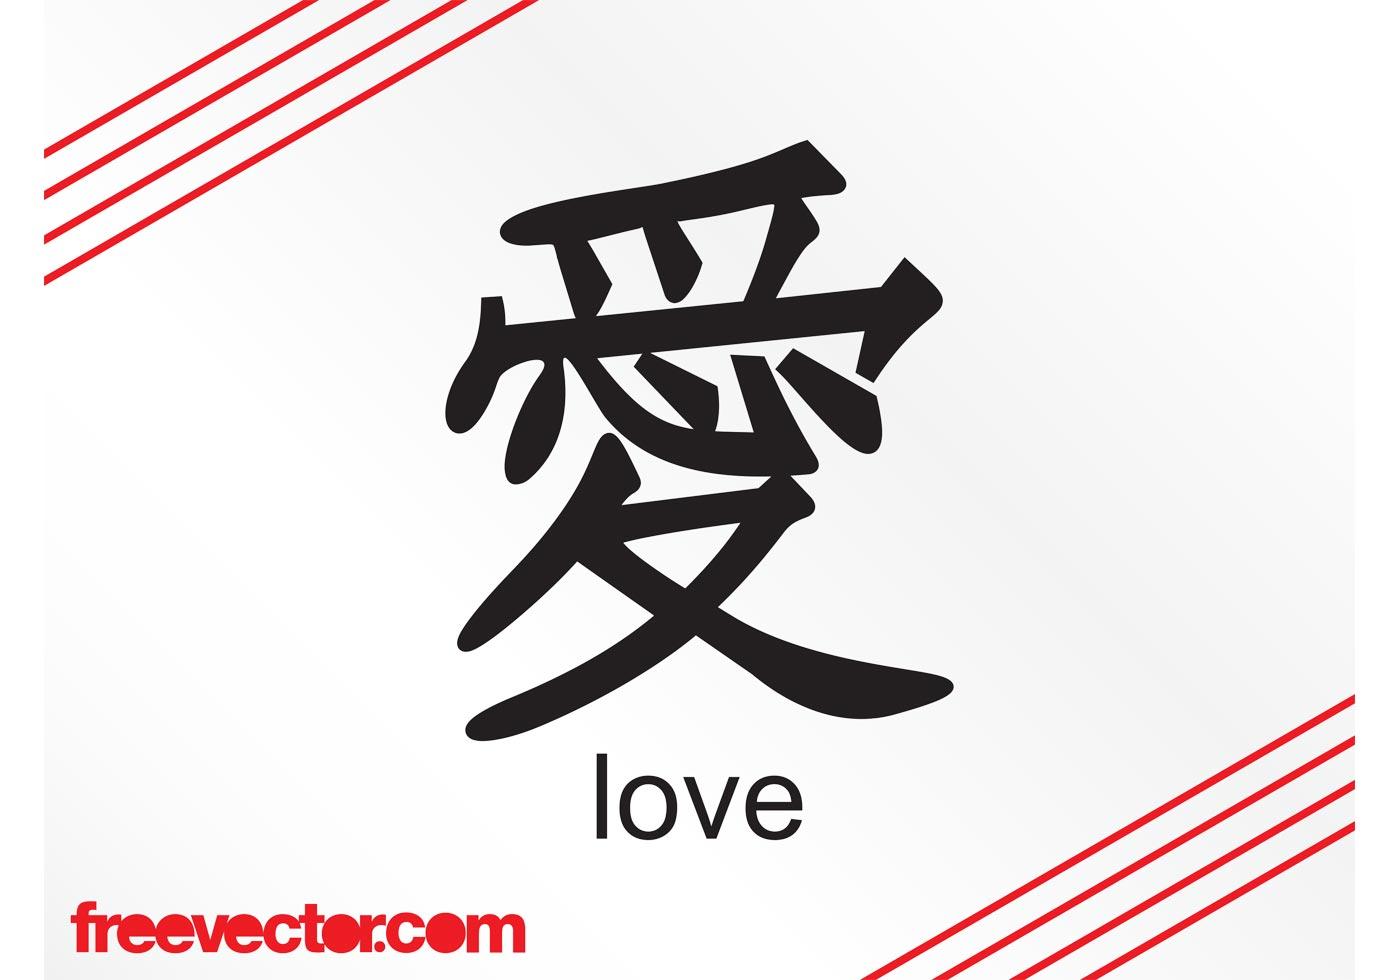 Love kanji character download free vector art stock graphics love kanji character download free vector art stock graphics images buycottarizona Images